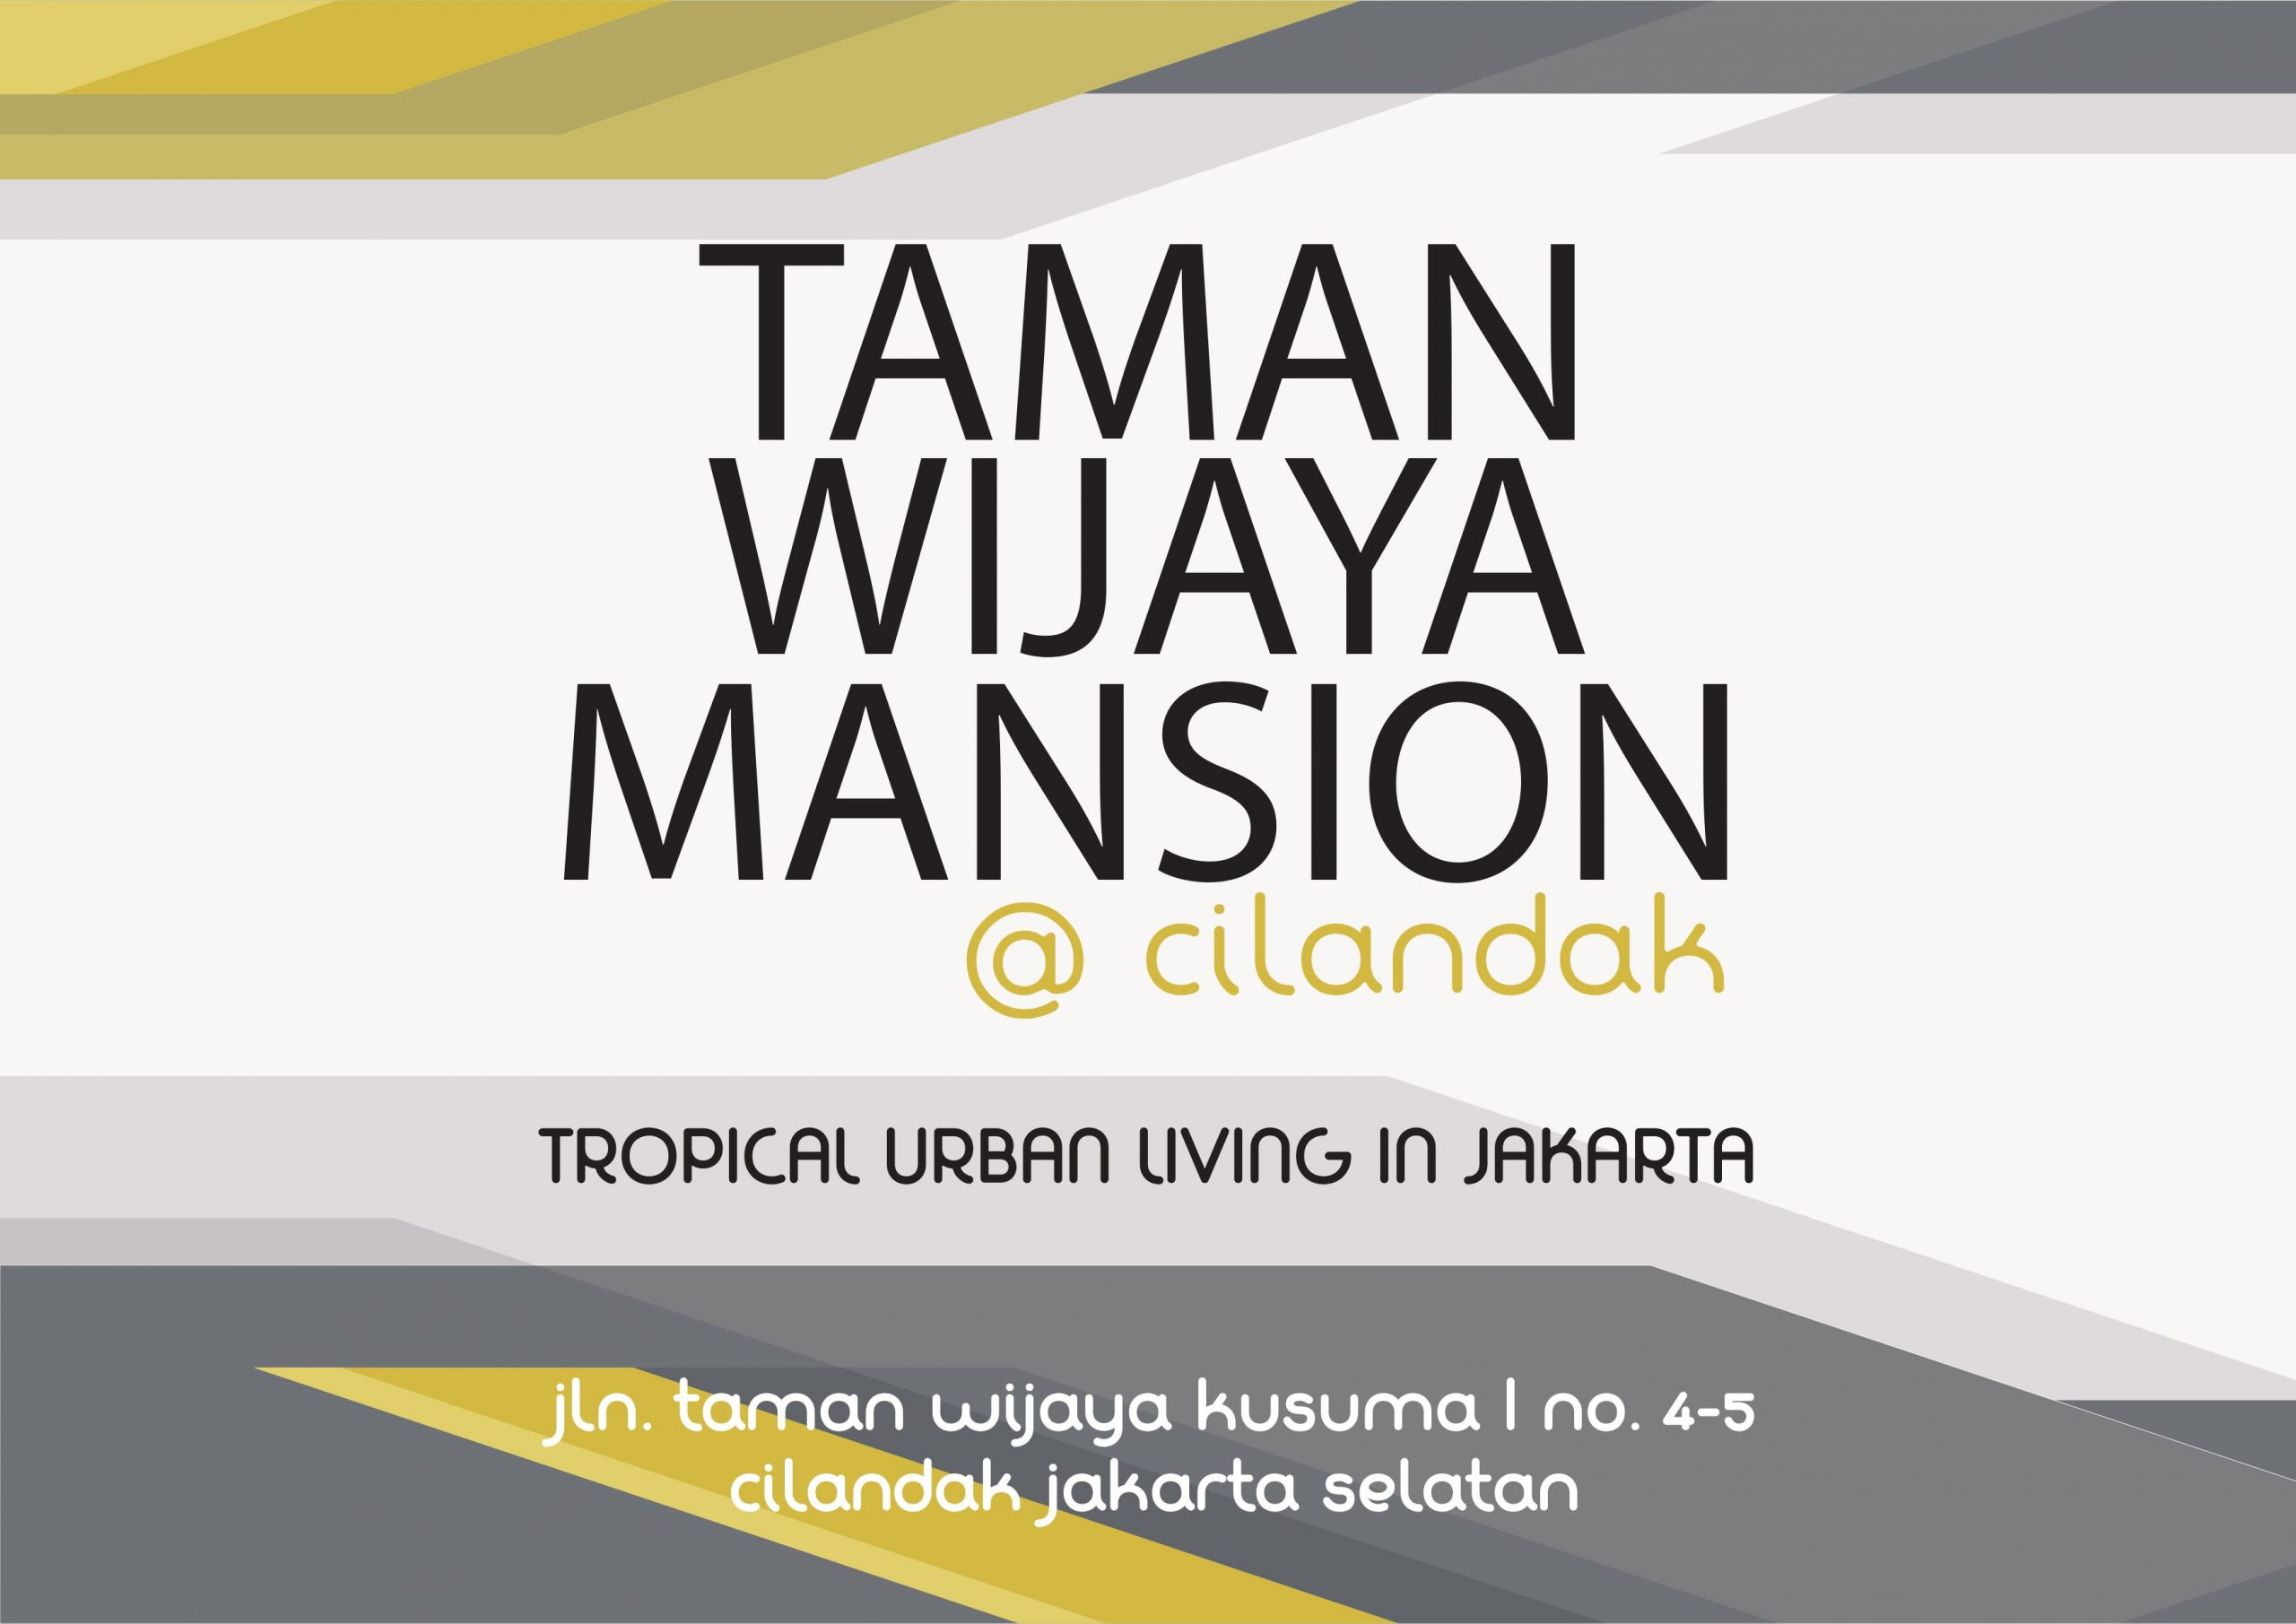 Taman Wijaya Mansion Marketing 08111229182